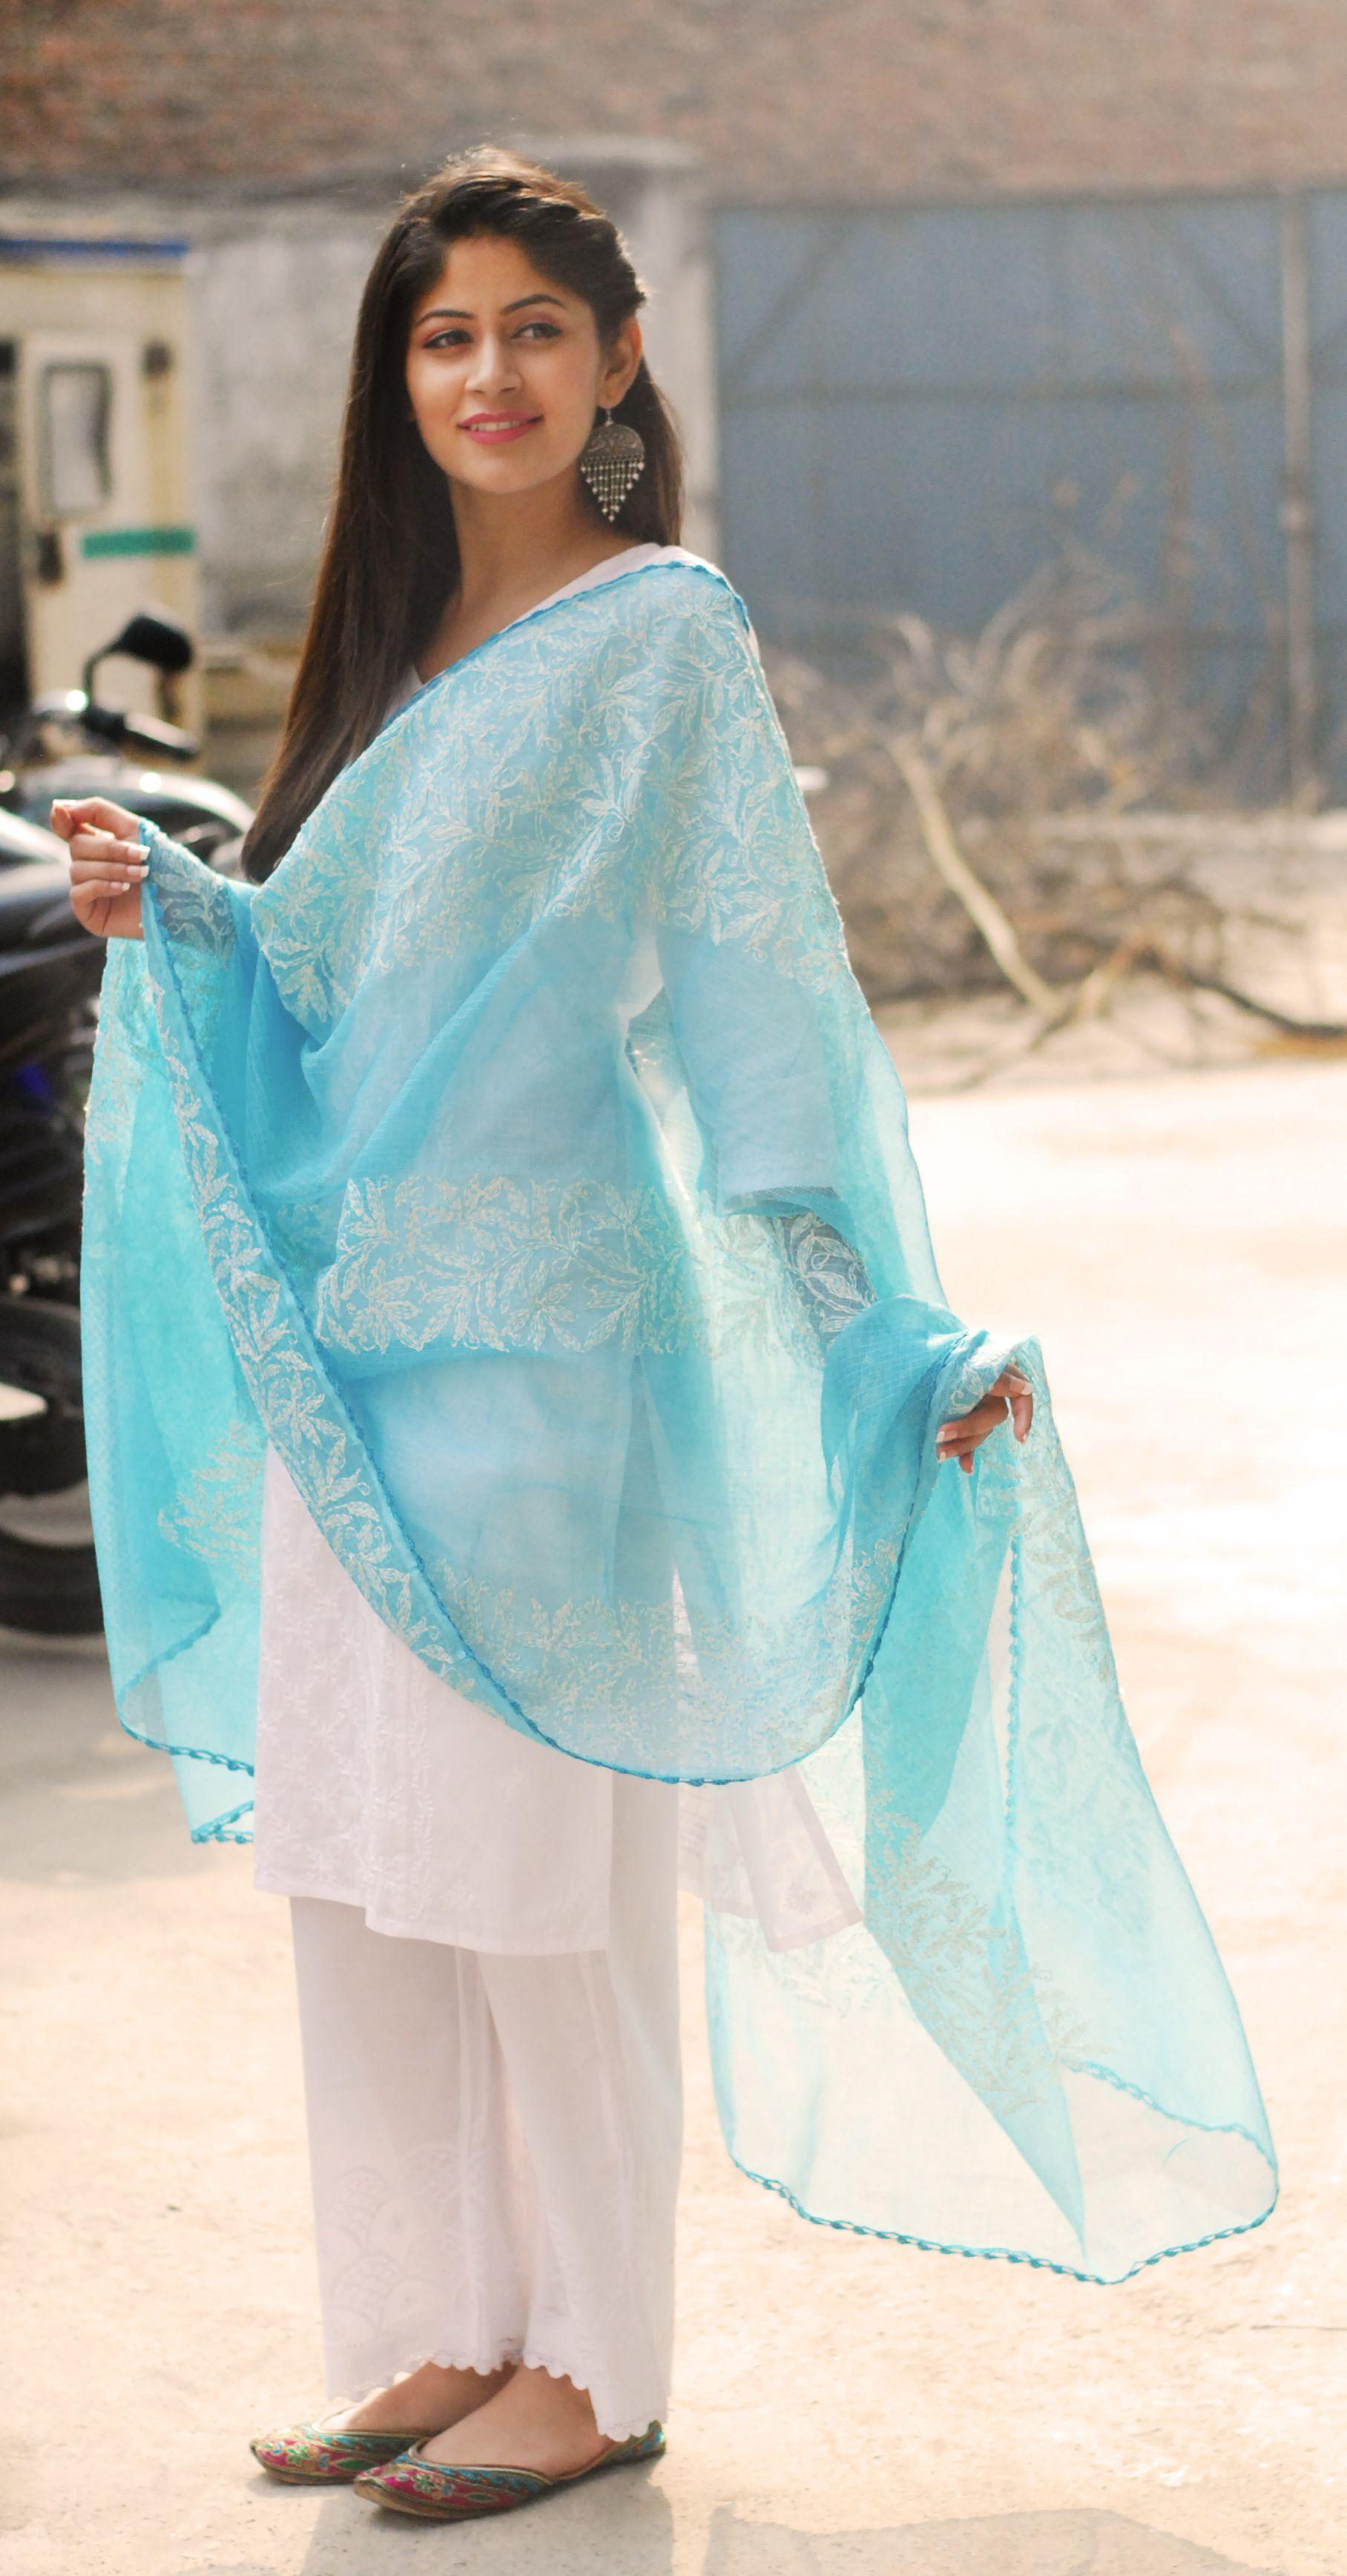 Ihram Kids For Sale Dubai: Adore Dupatta And Earrings!! Pair The Sky-blue Chikankari